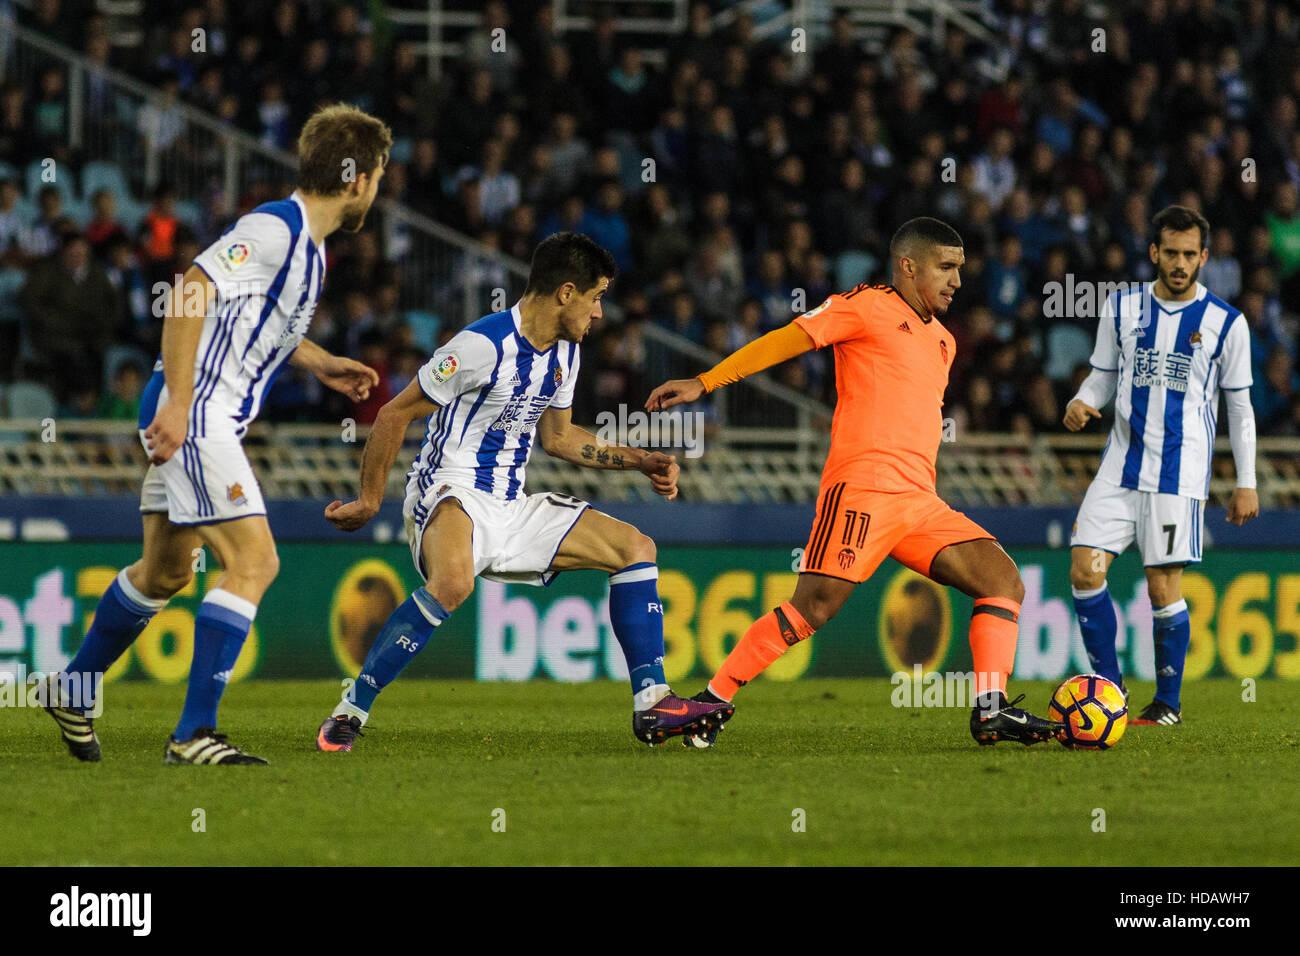 San Sebastian, Gipuzcoa, Spain. 10th December, 2016. Valencia's forward Bakkali in action during the Liga Santander - Stock Image